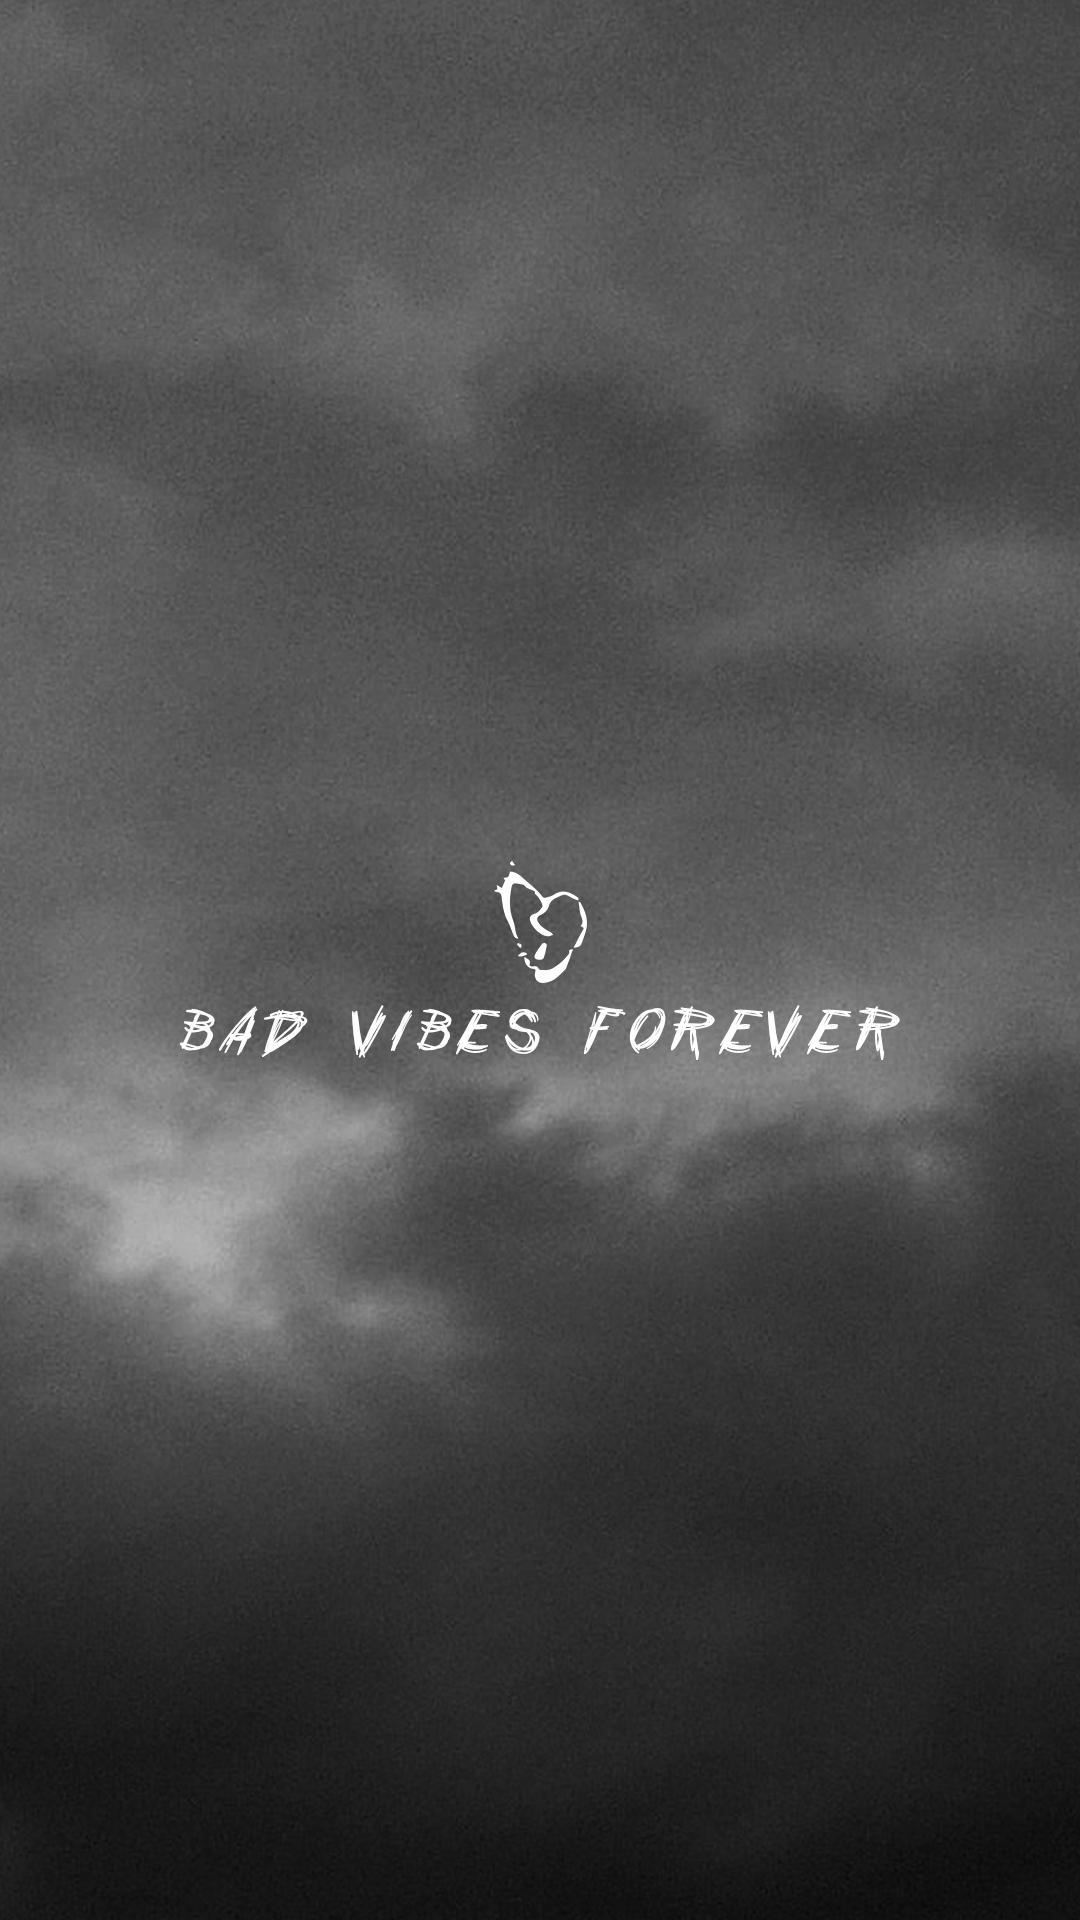 Bad Vibes Forever Desktop Wallpaper 1920x1080 XXXTENTACION 1080x1920